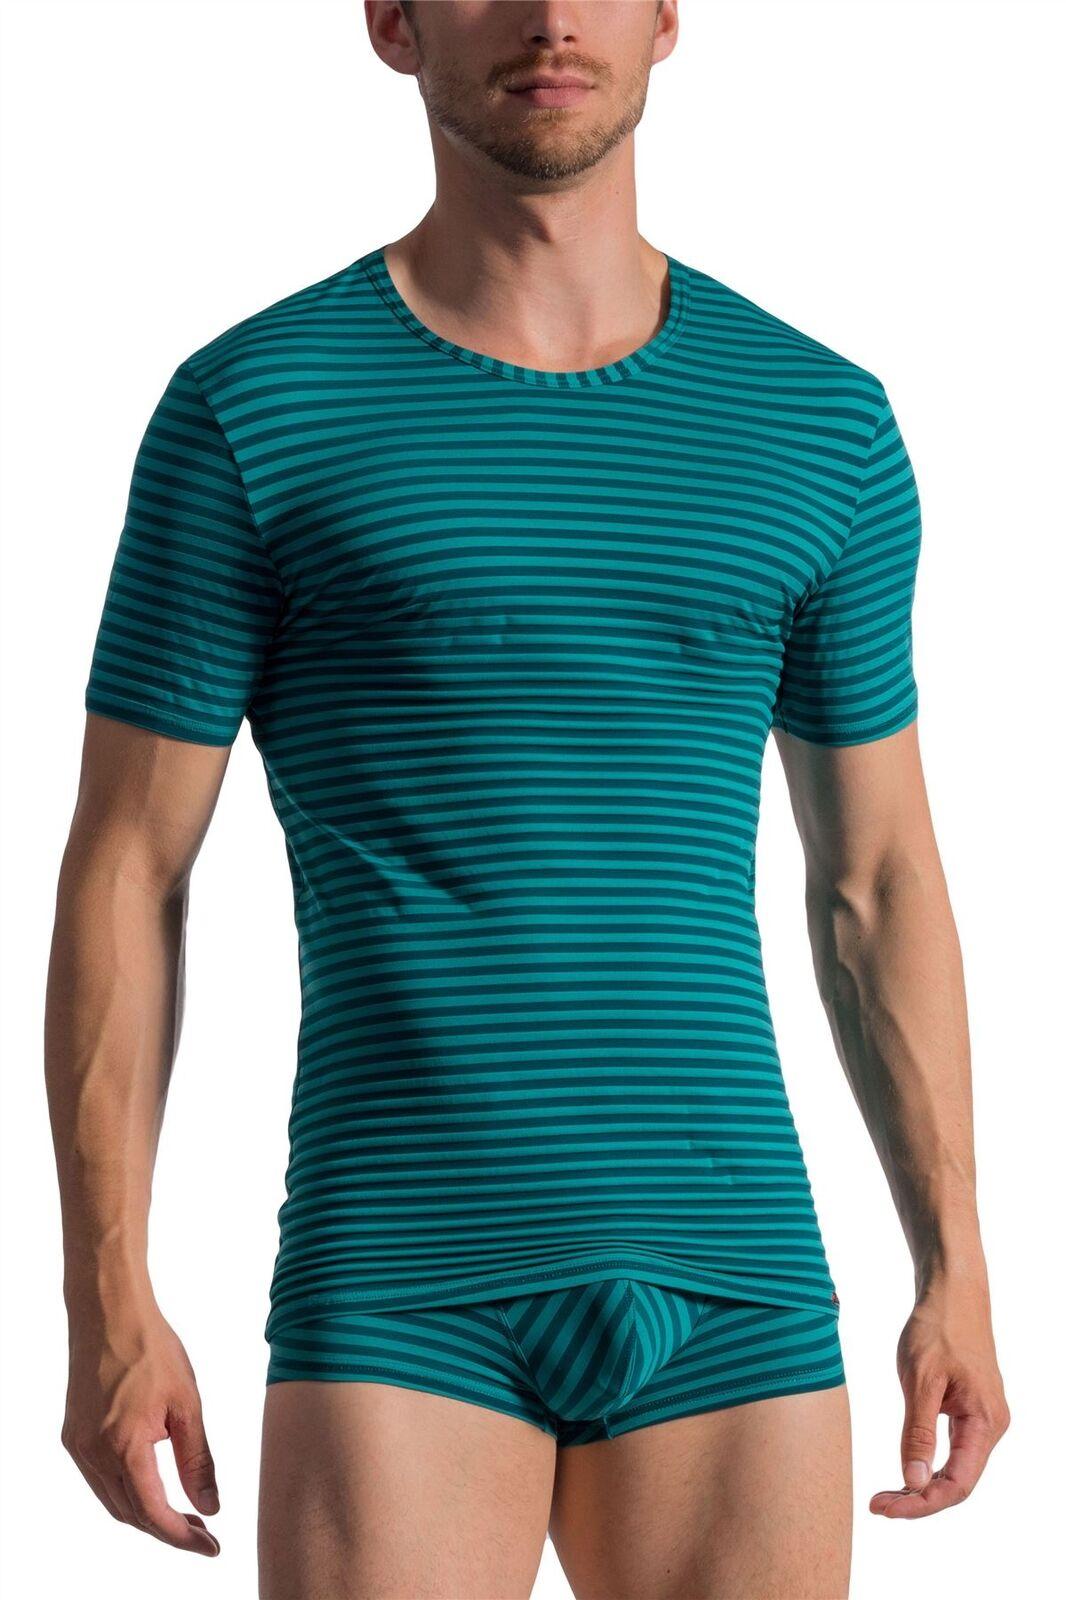 Olaf Benz rot 1761 T-Shirt Stripe Top Designer (Matching Underwear Availible)